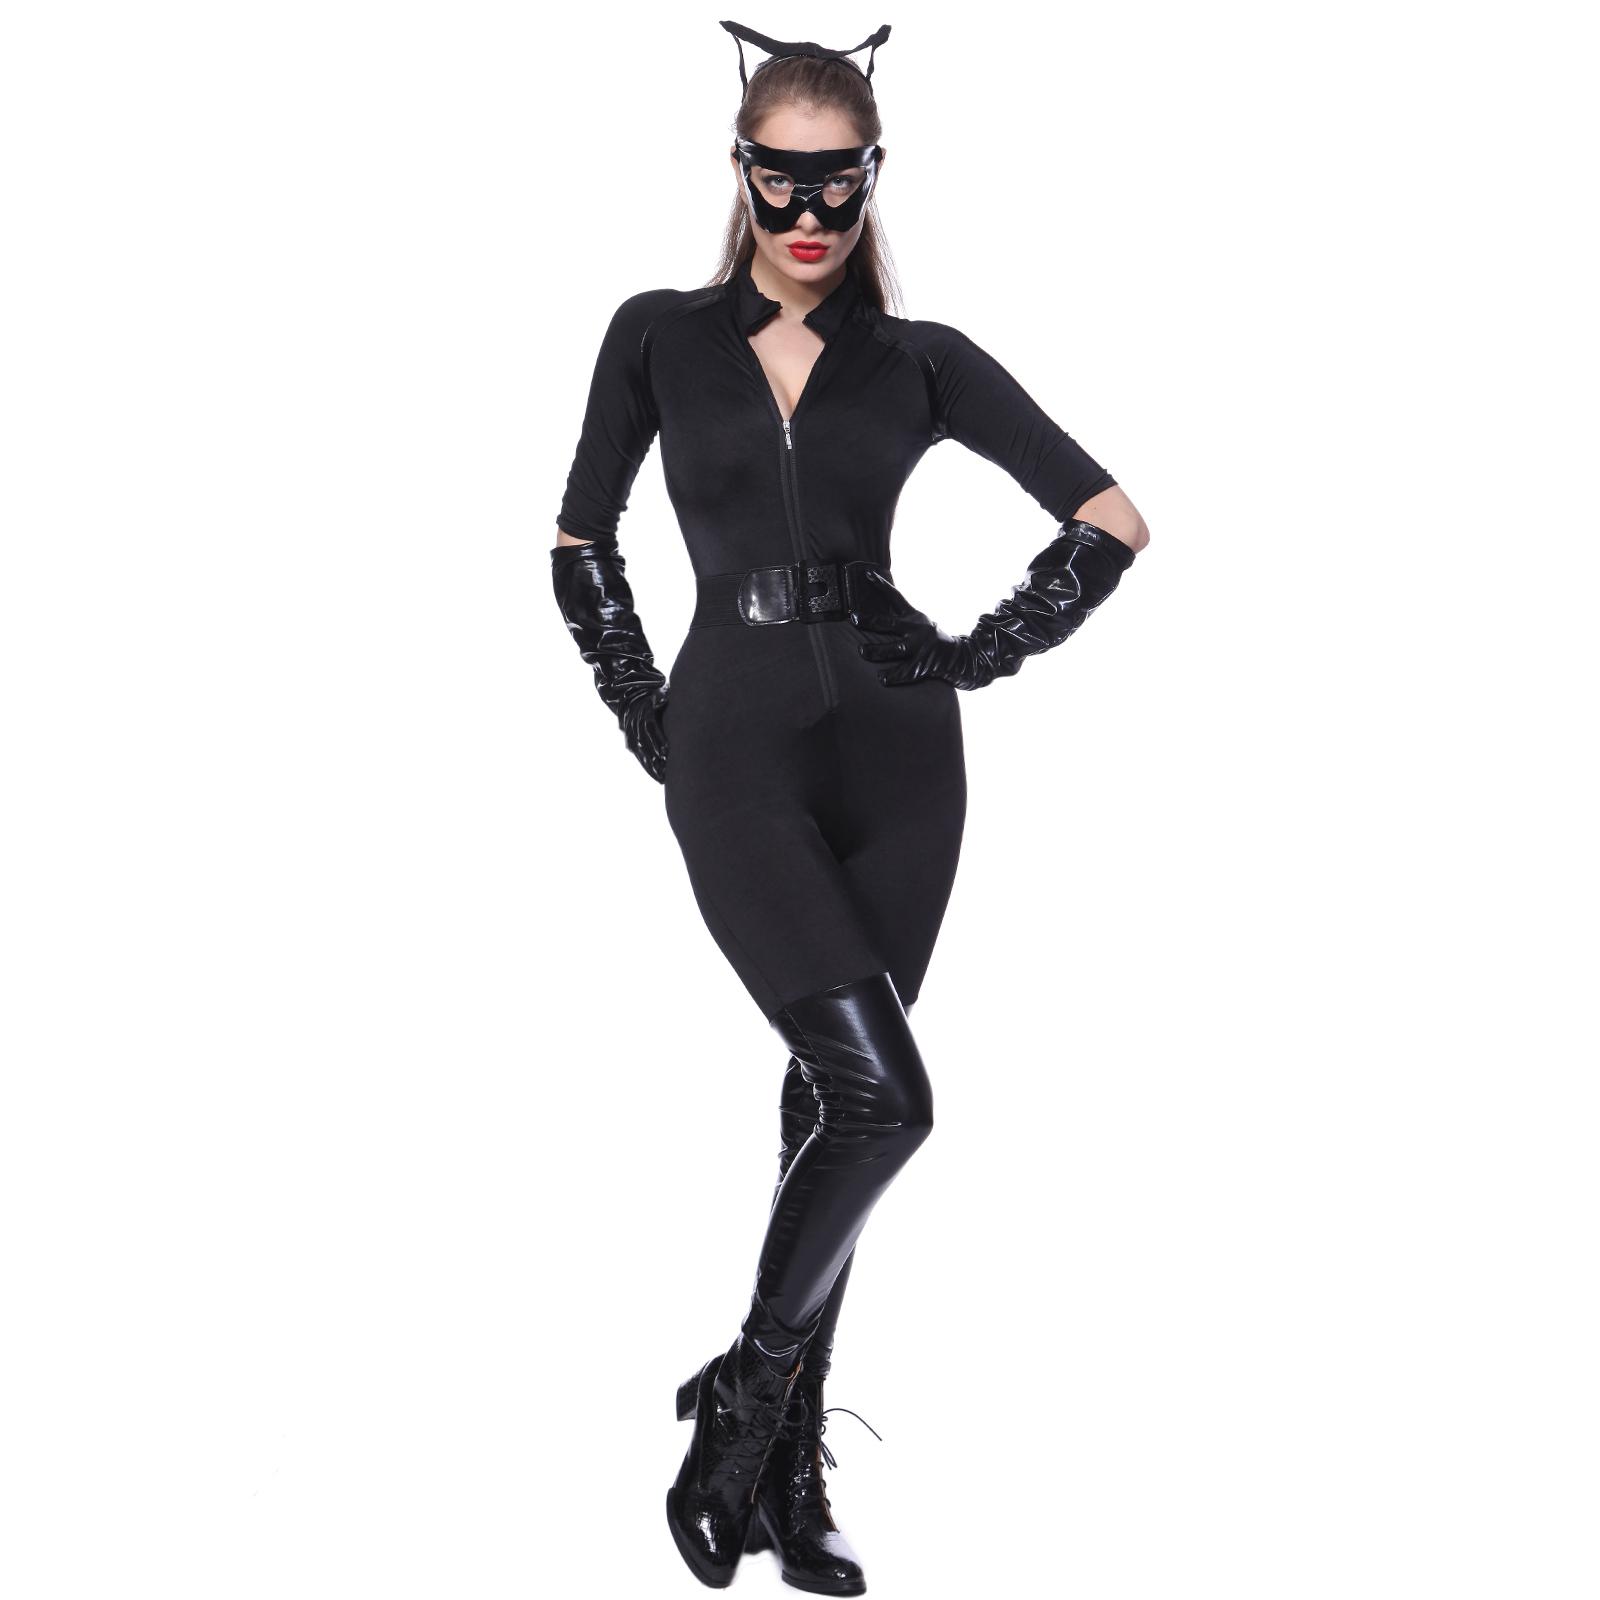 5tlg ganzk rper ganzanzug catsuit overall batman batgirl kost m damen catwomen ebay. Black Bedroom Furniture Sets. Home Design Ideas